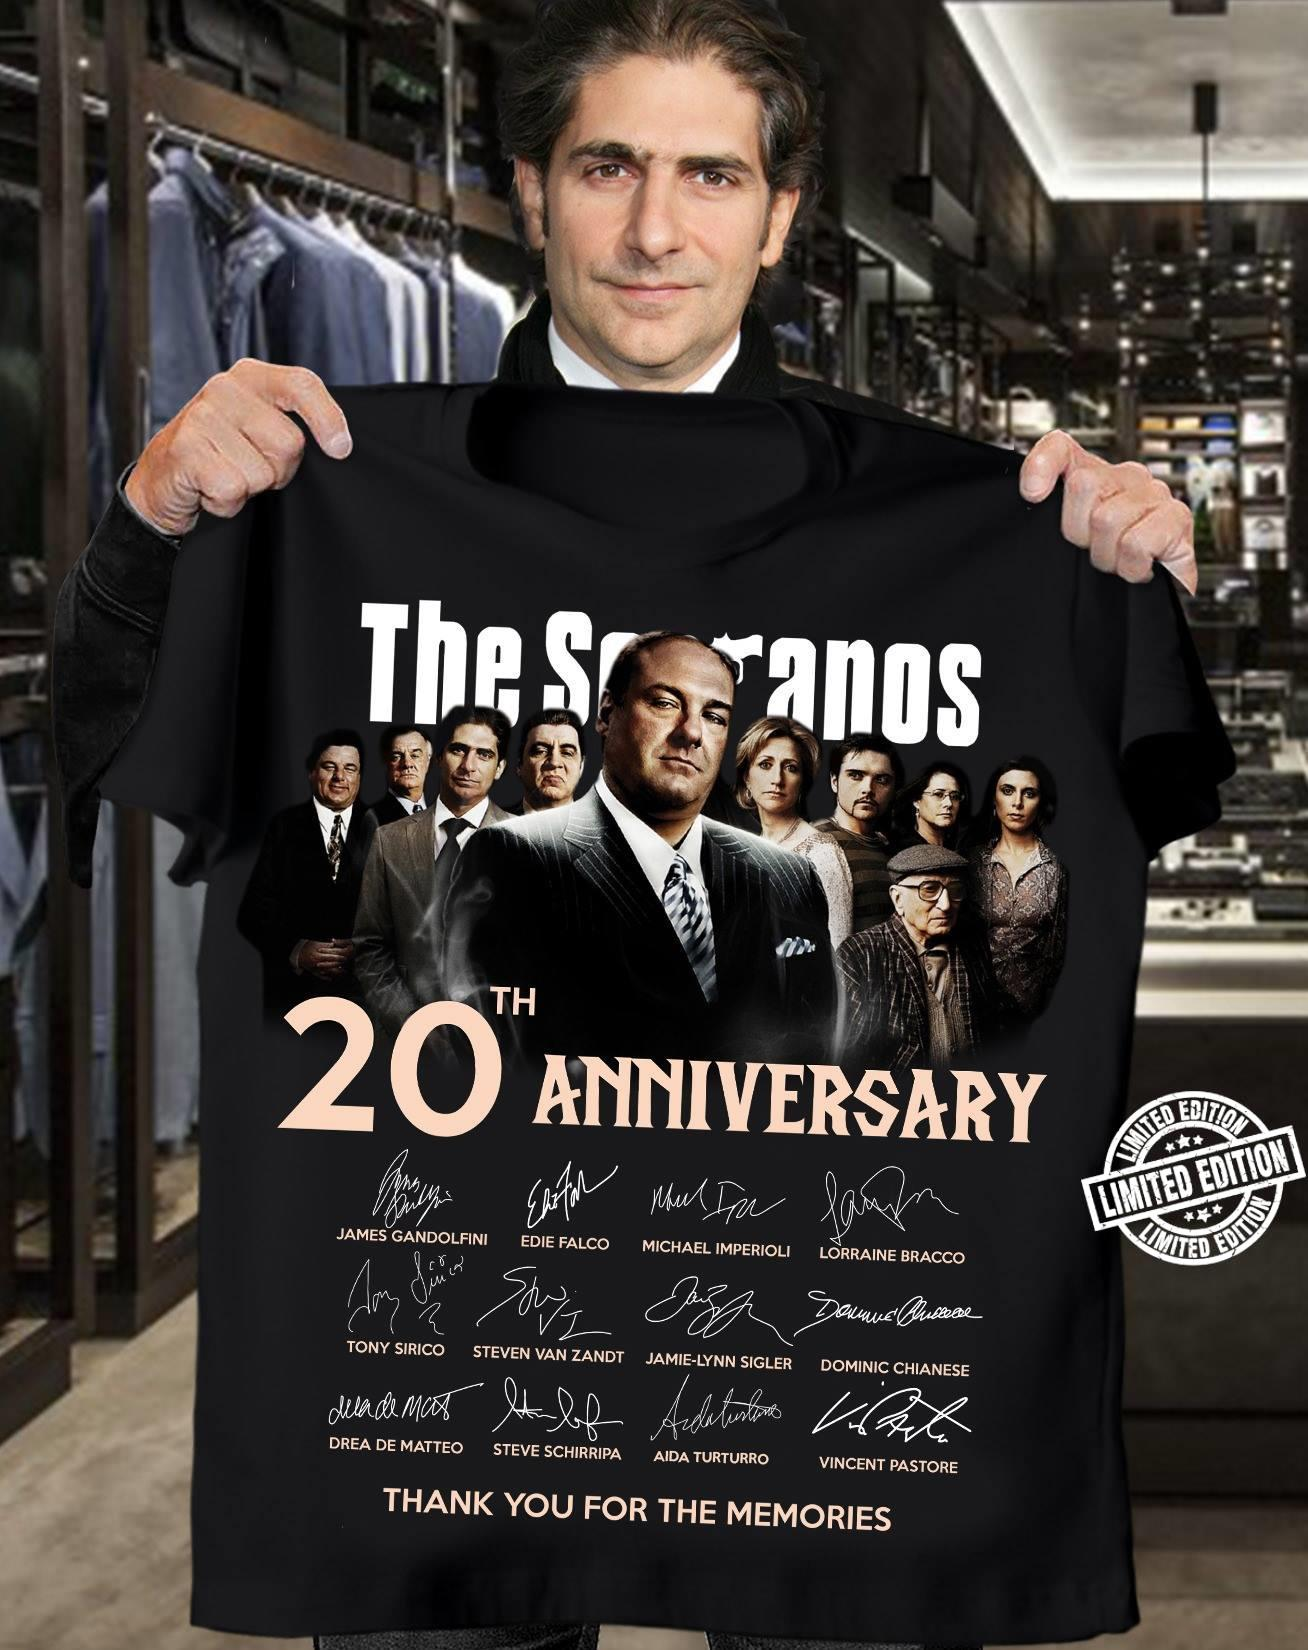 the sopranos 20th anniversary signature shirt